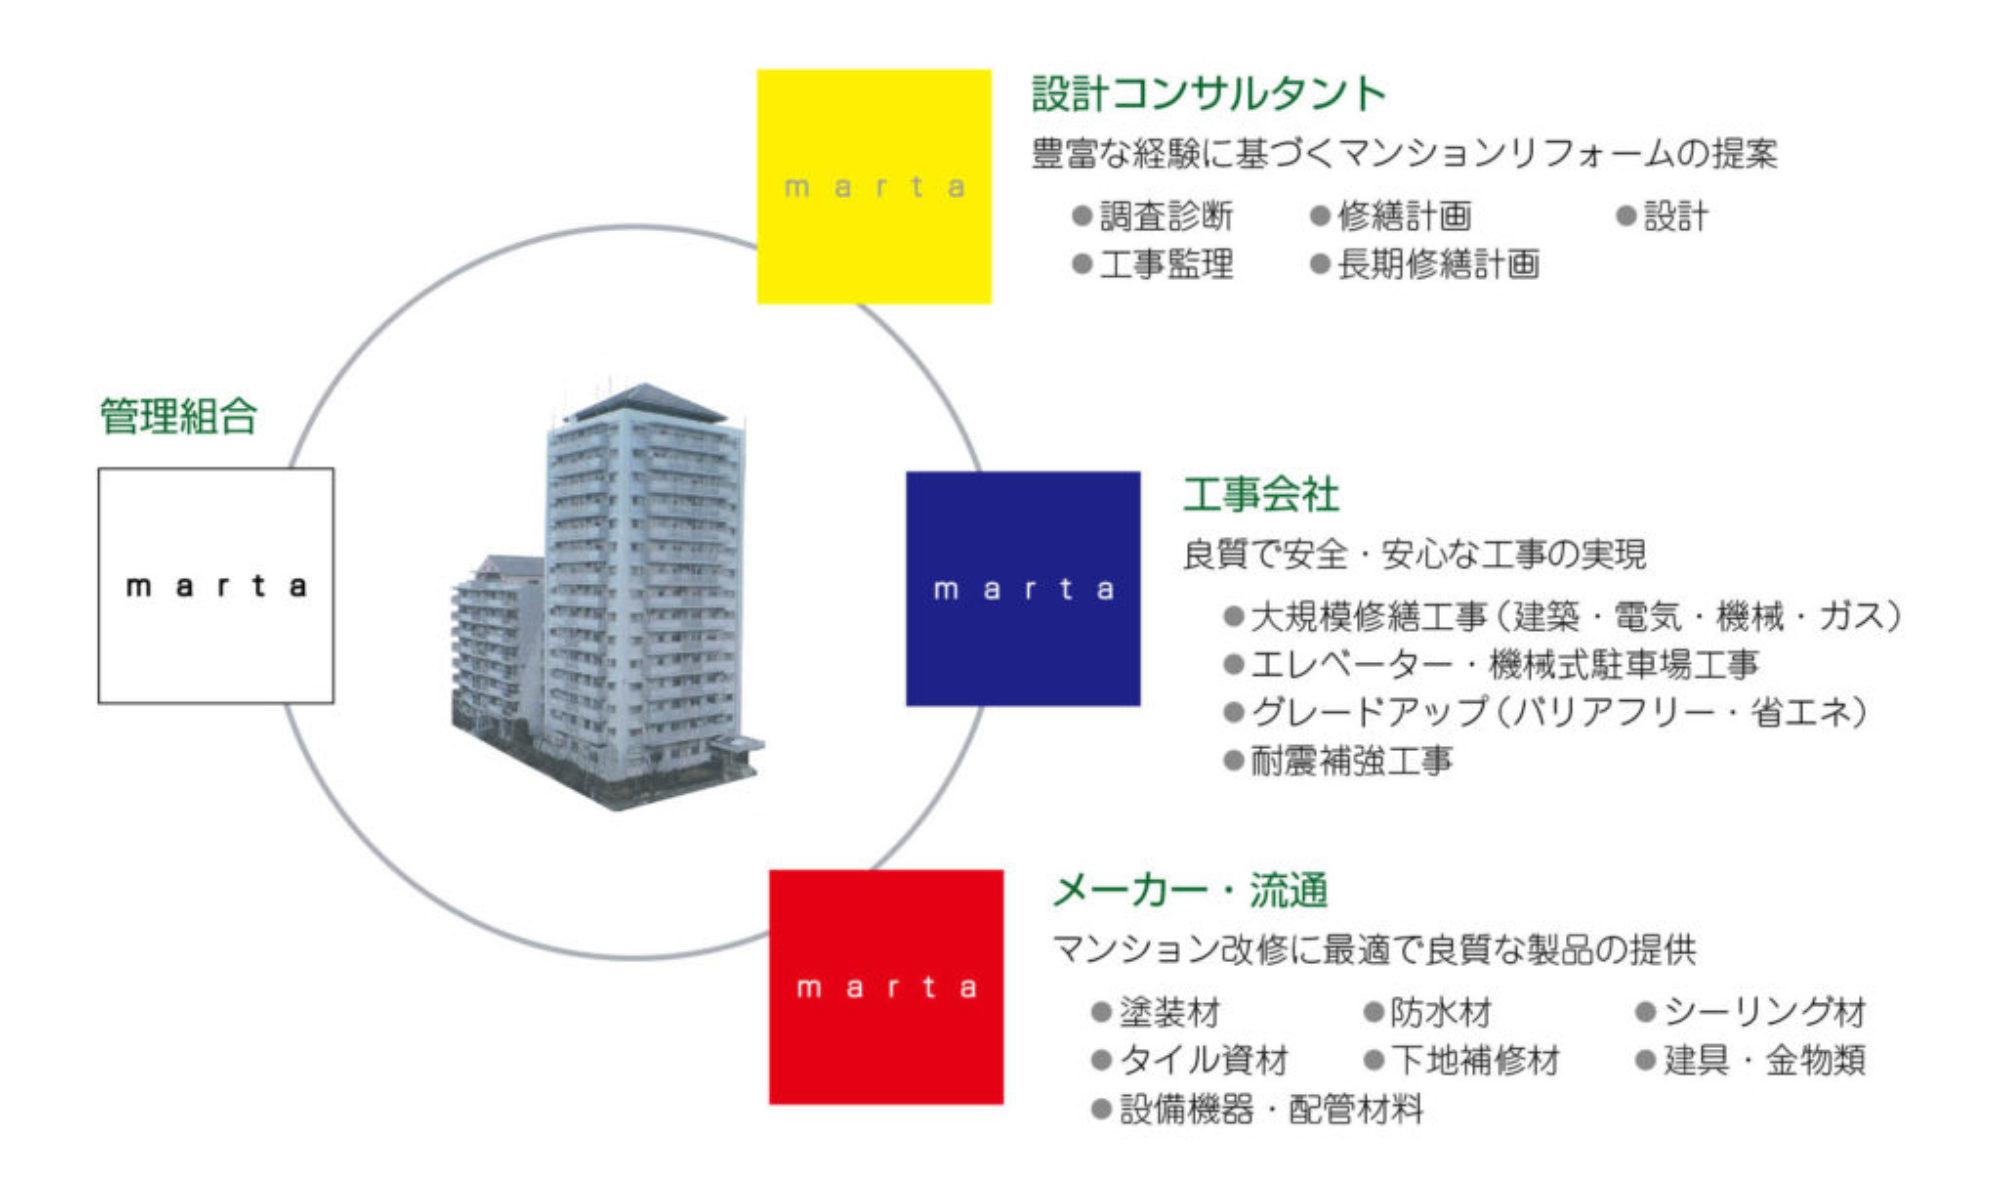 marta_relationship_diagram